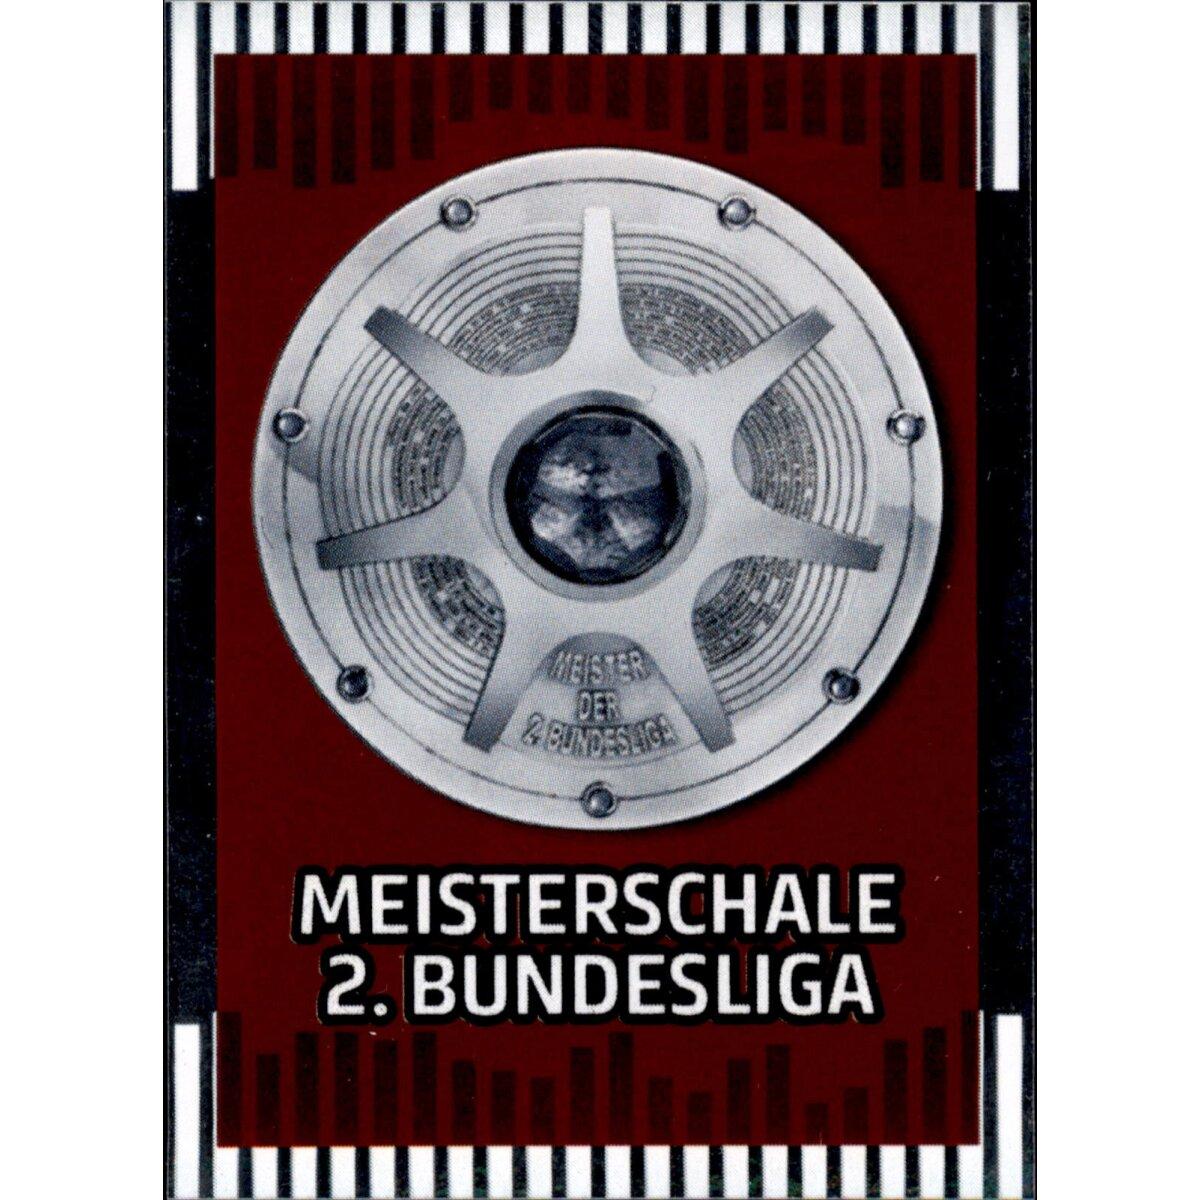 Topps Bundesliga 2017 2018 Sticker 3 Meisterschale 2 Bundesliga 0 69